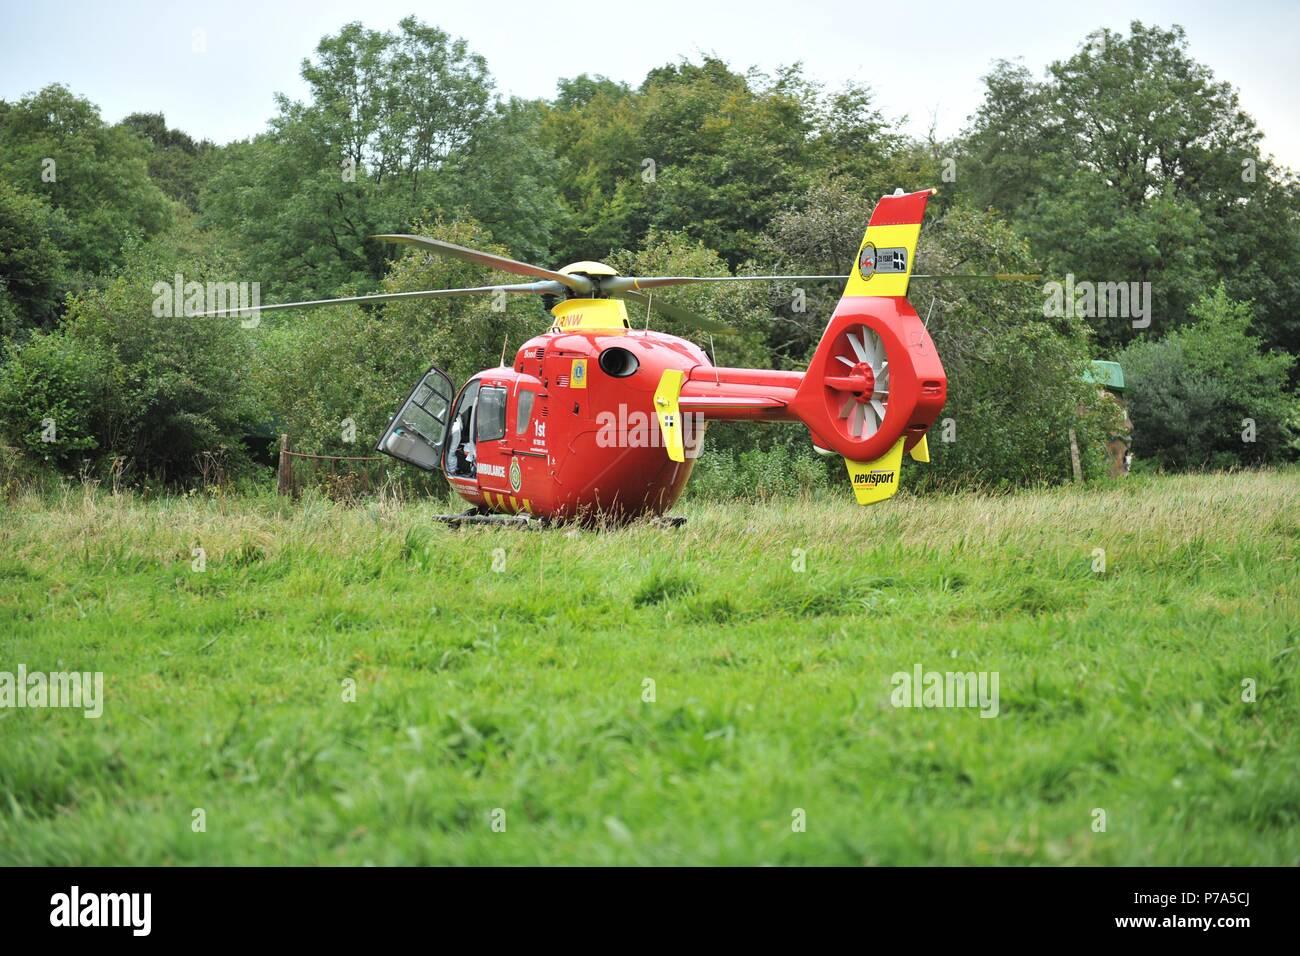 Devon Air Ambulance UK - Stock Image